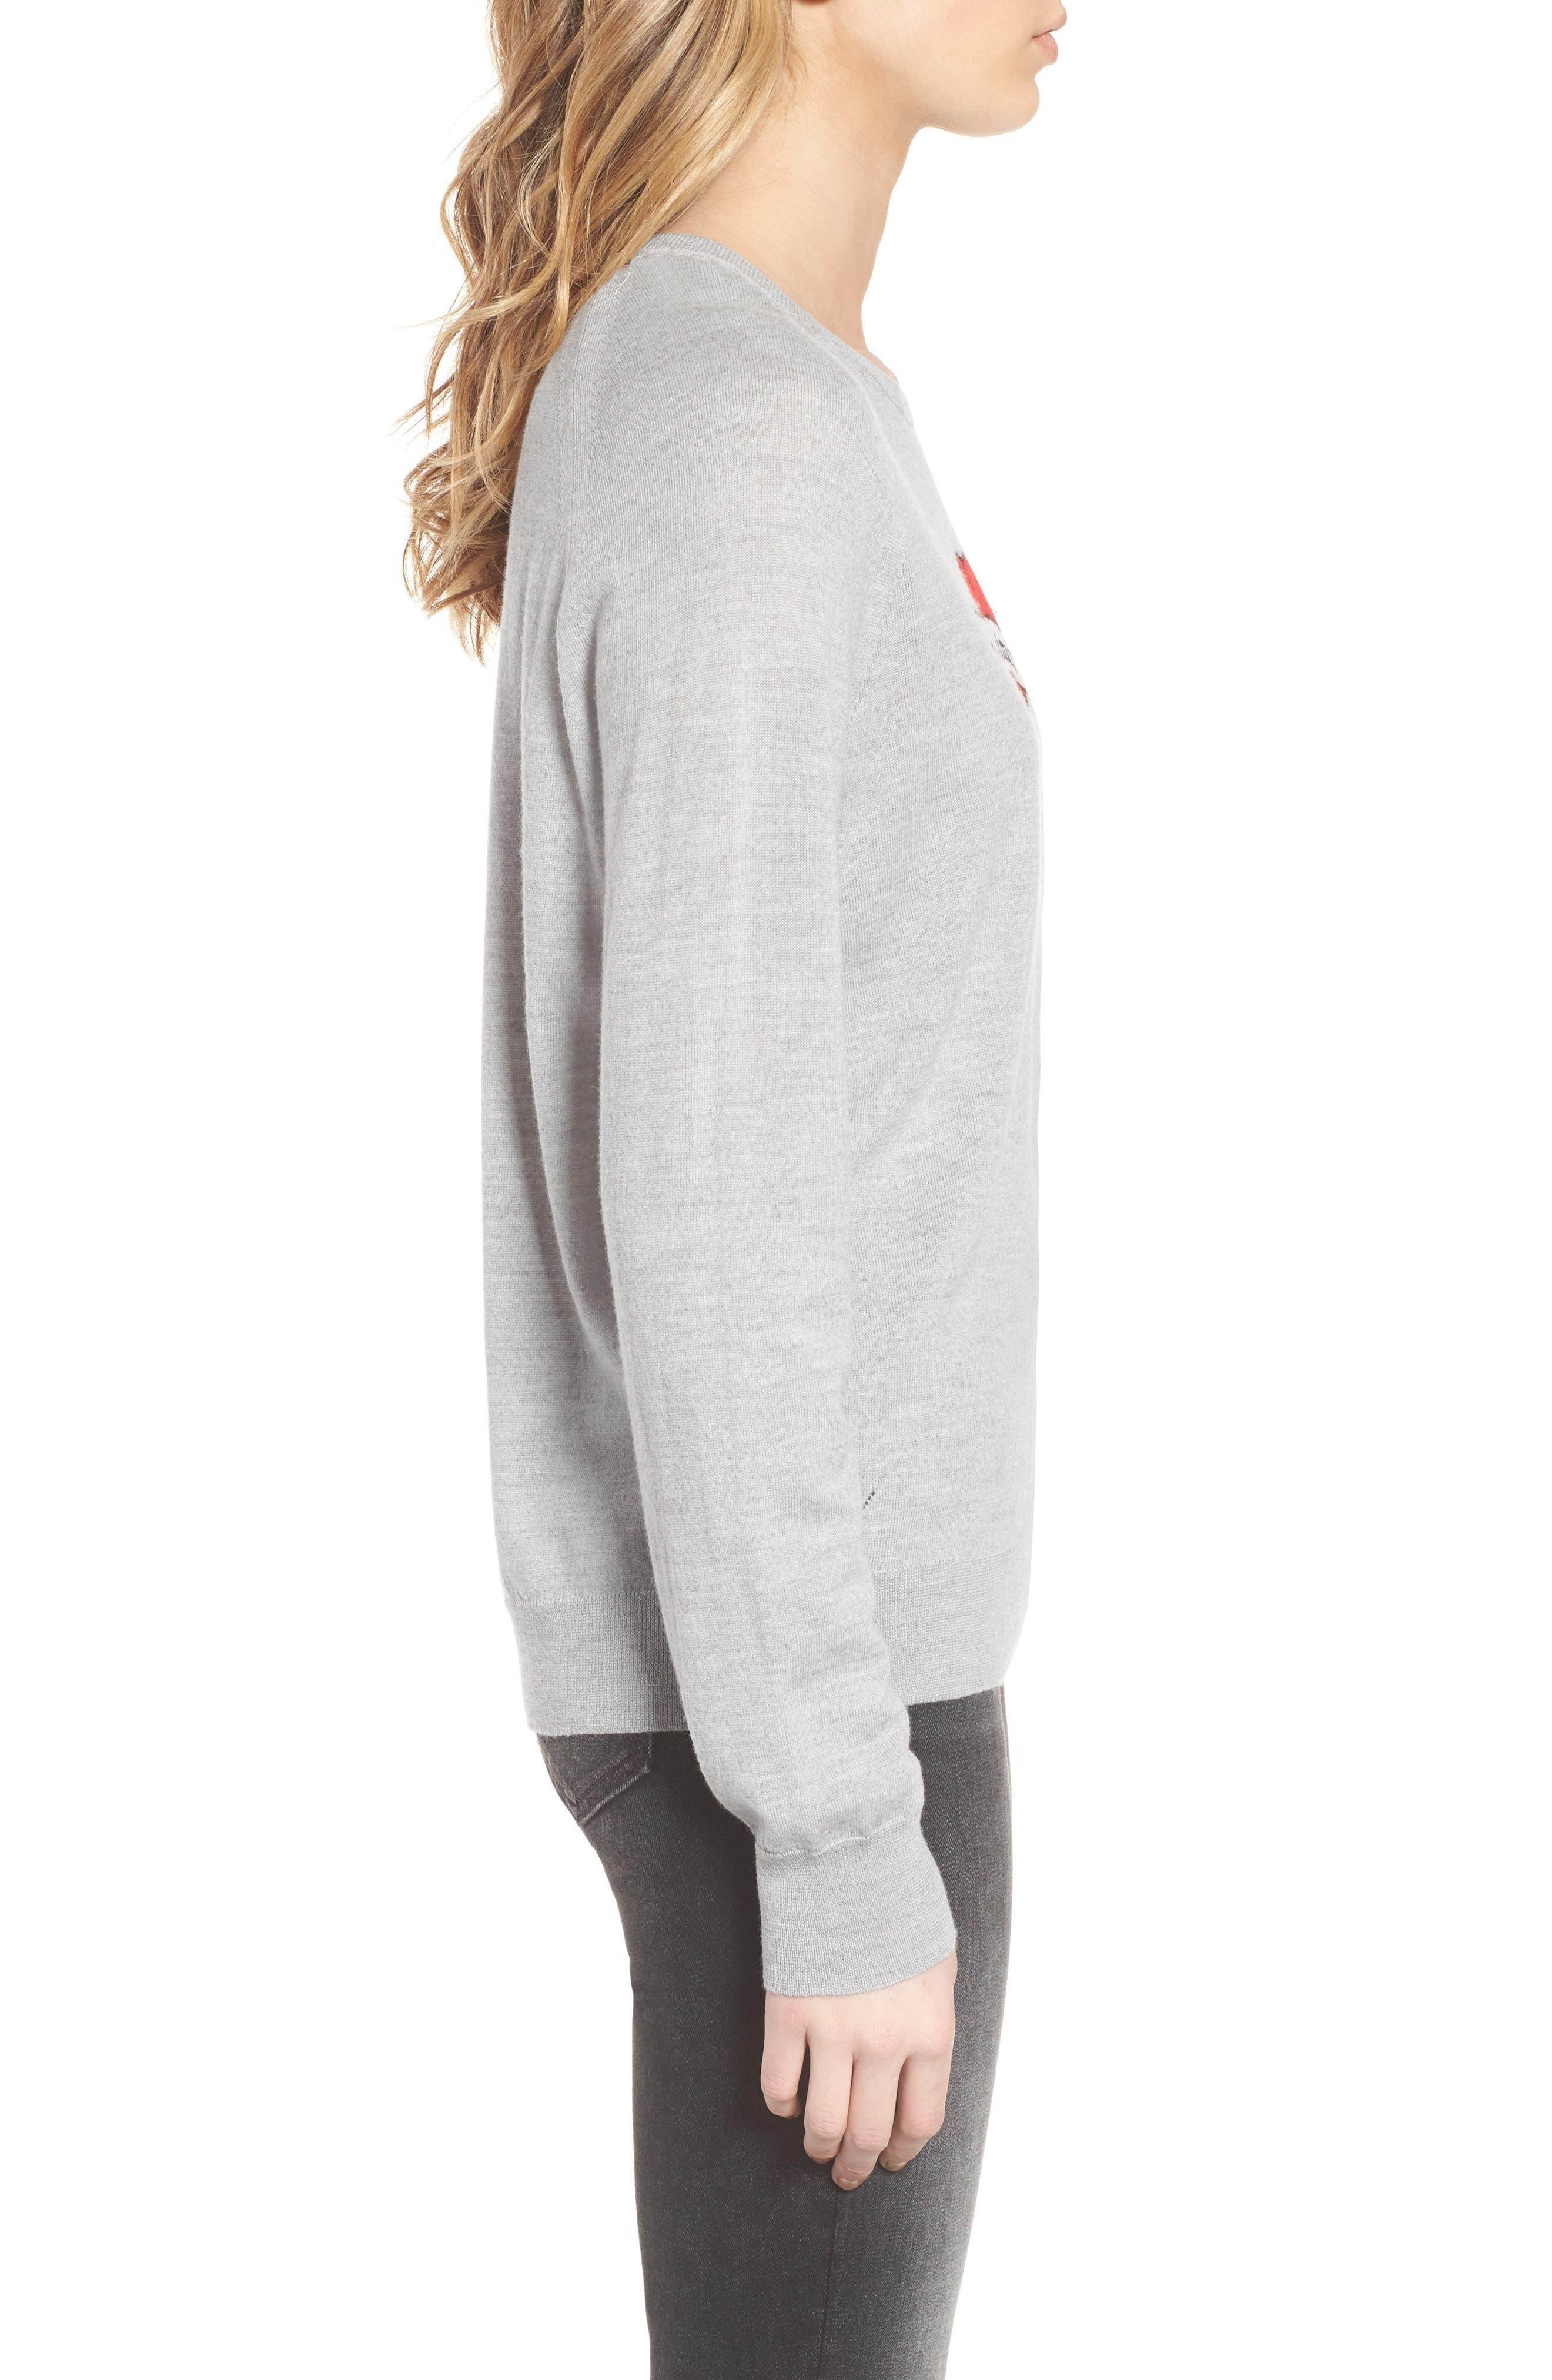 Rime Bis Merino Wool Sweater,                             Alternate thumbnail 3, color,                             Grey